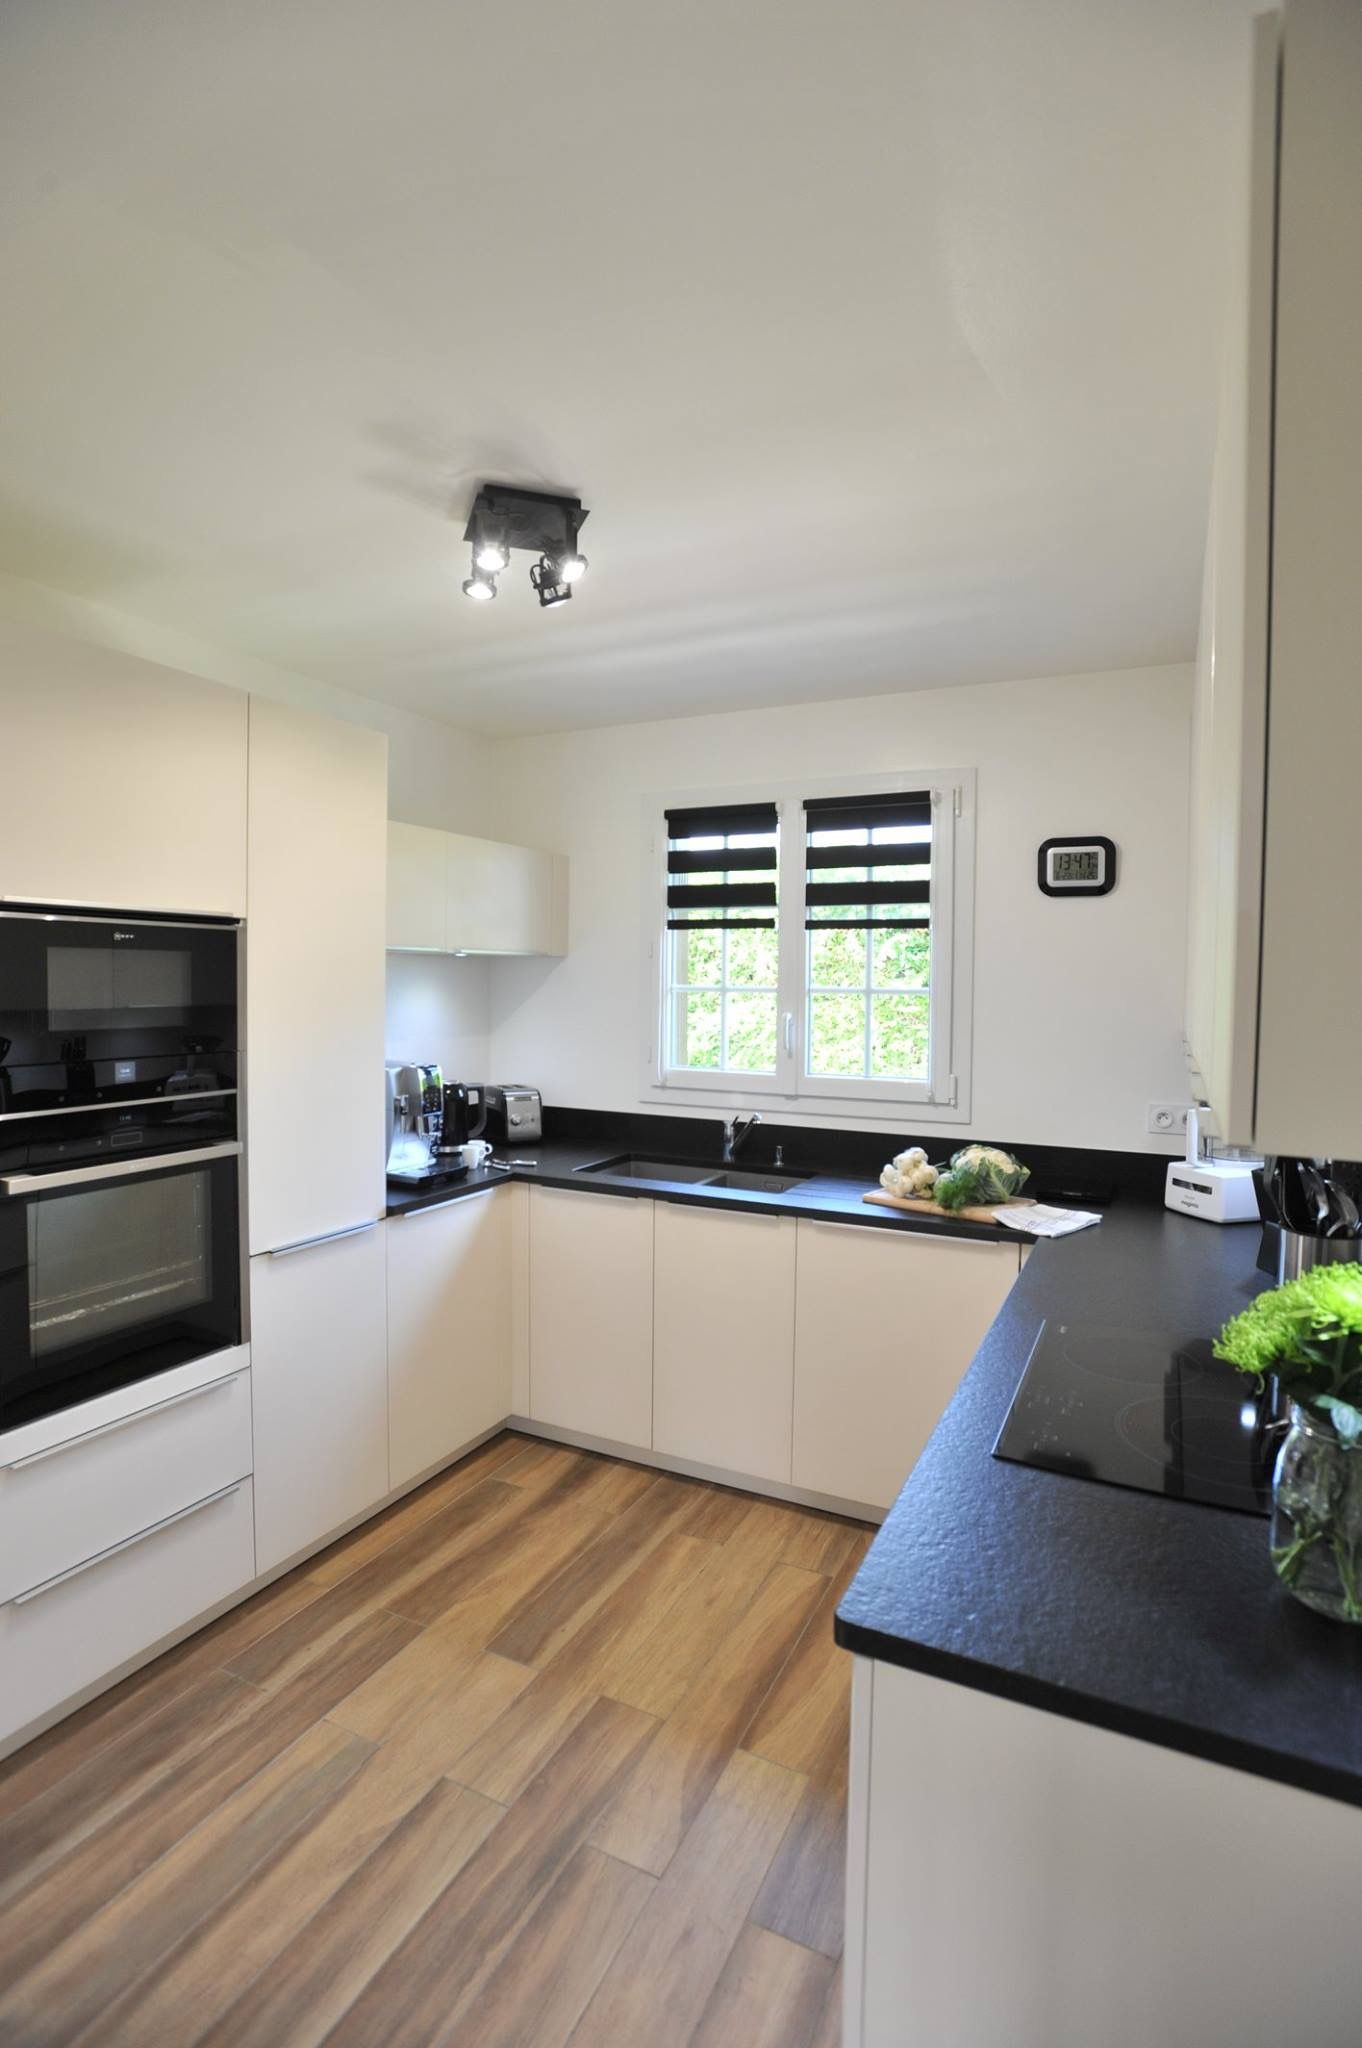 Deco Cuisine Contemporaine Blanche aménagement et décoration cuisine, cuisine blanche et noire